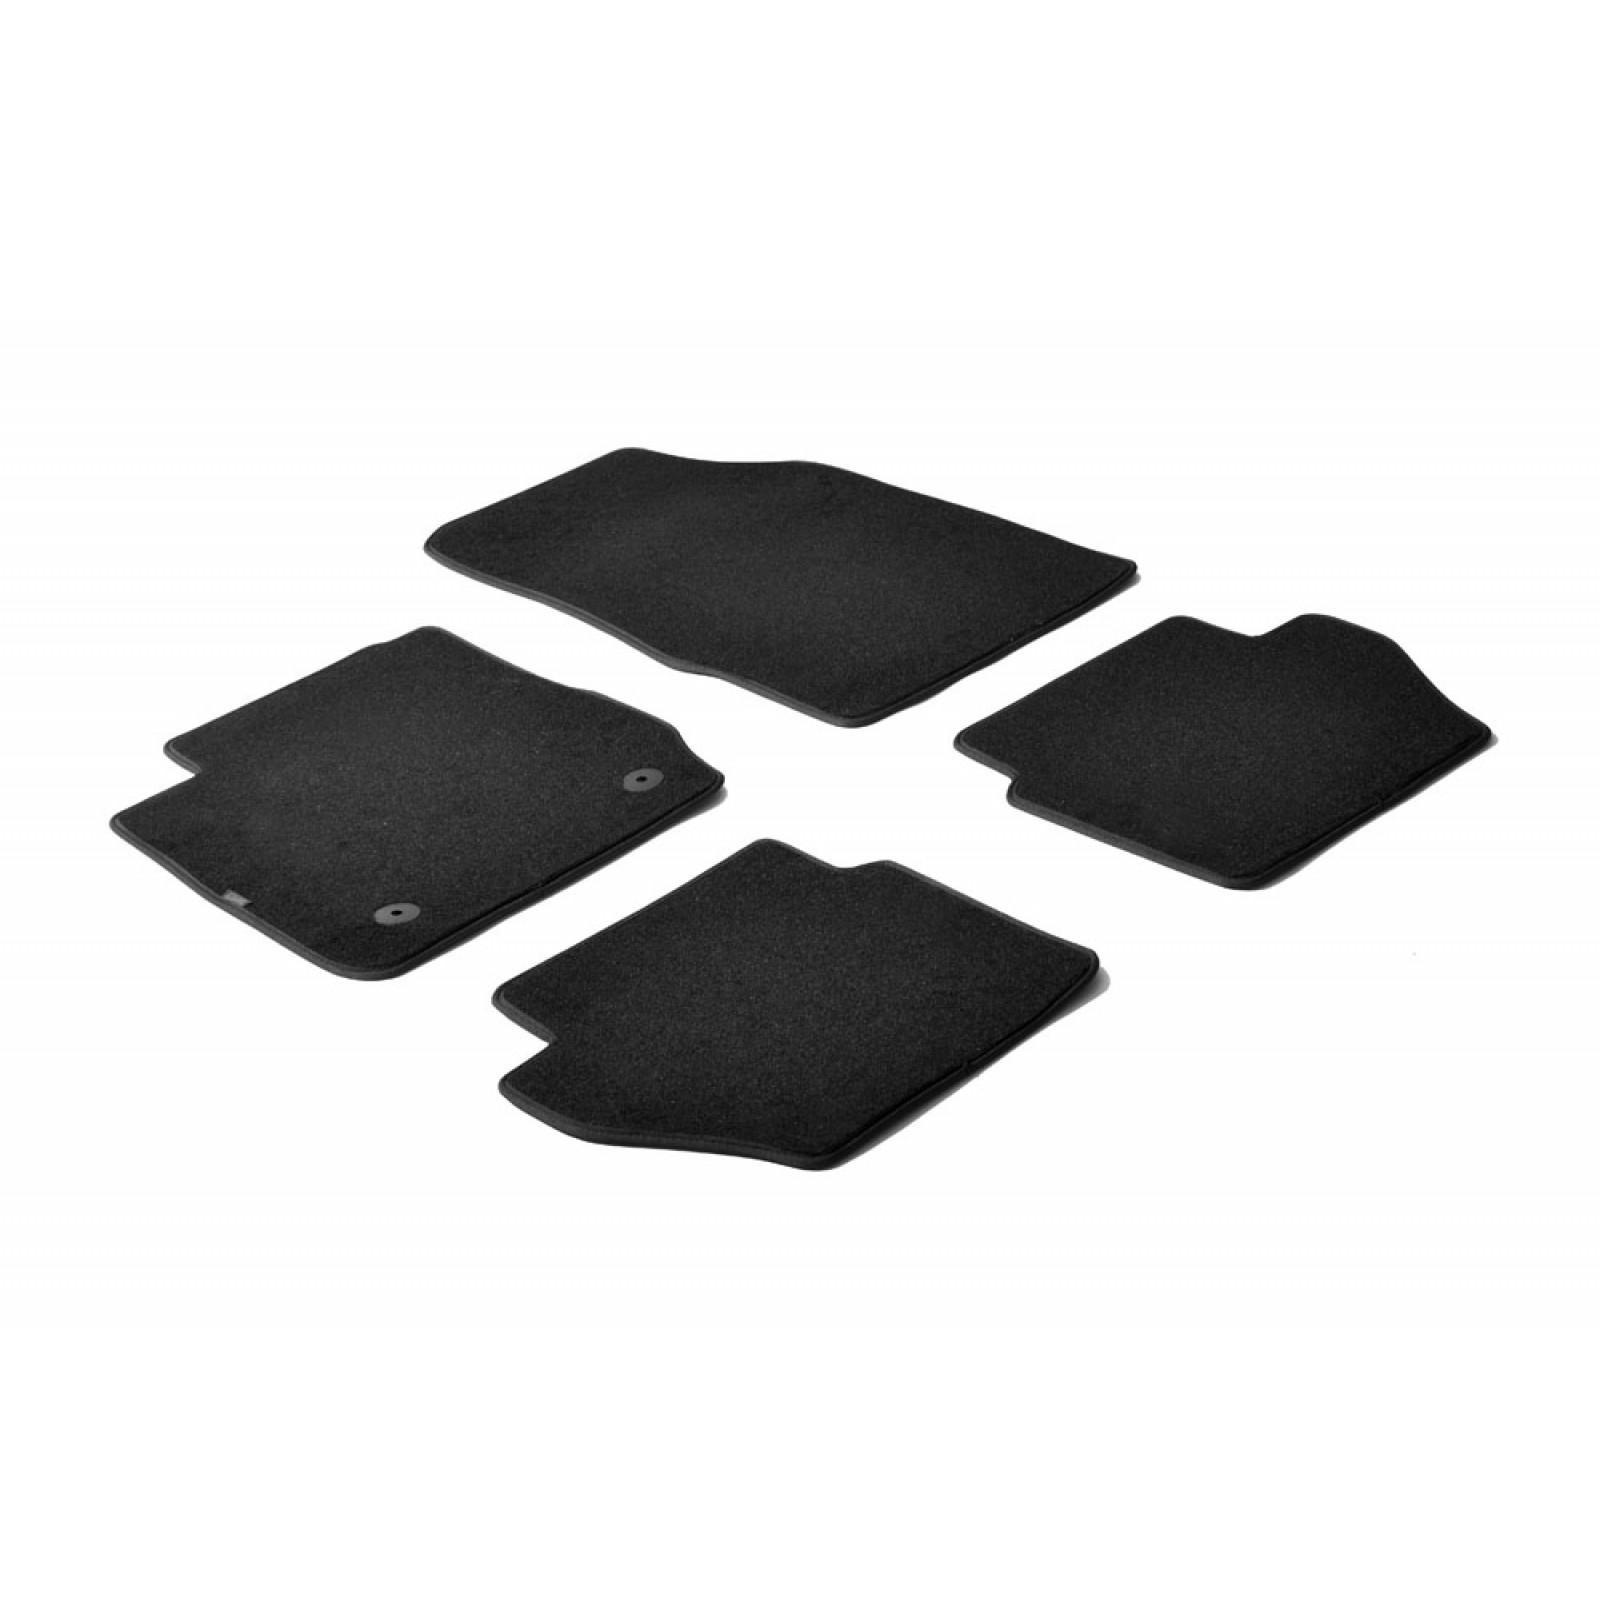 tapis en textile pour ford fiesta. Black Bedroom Furniture Sets. Home Design Ideas